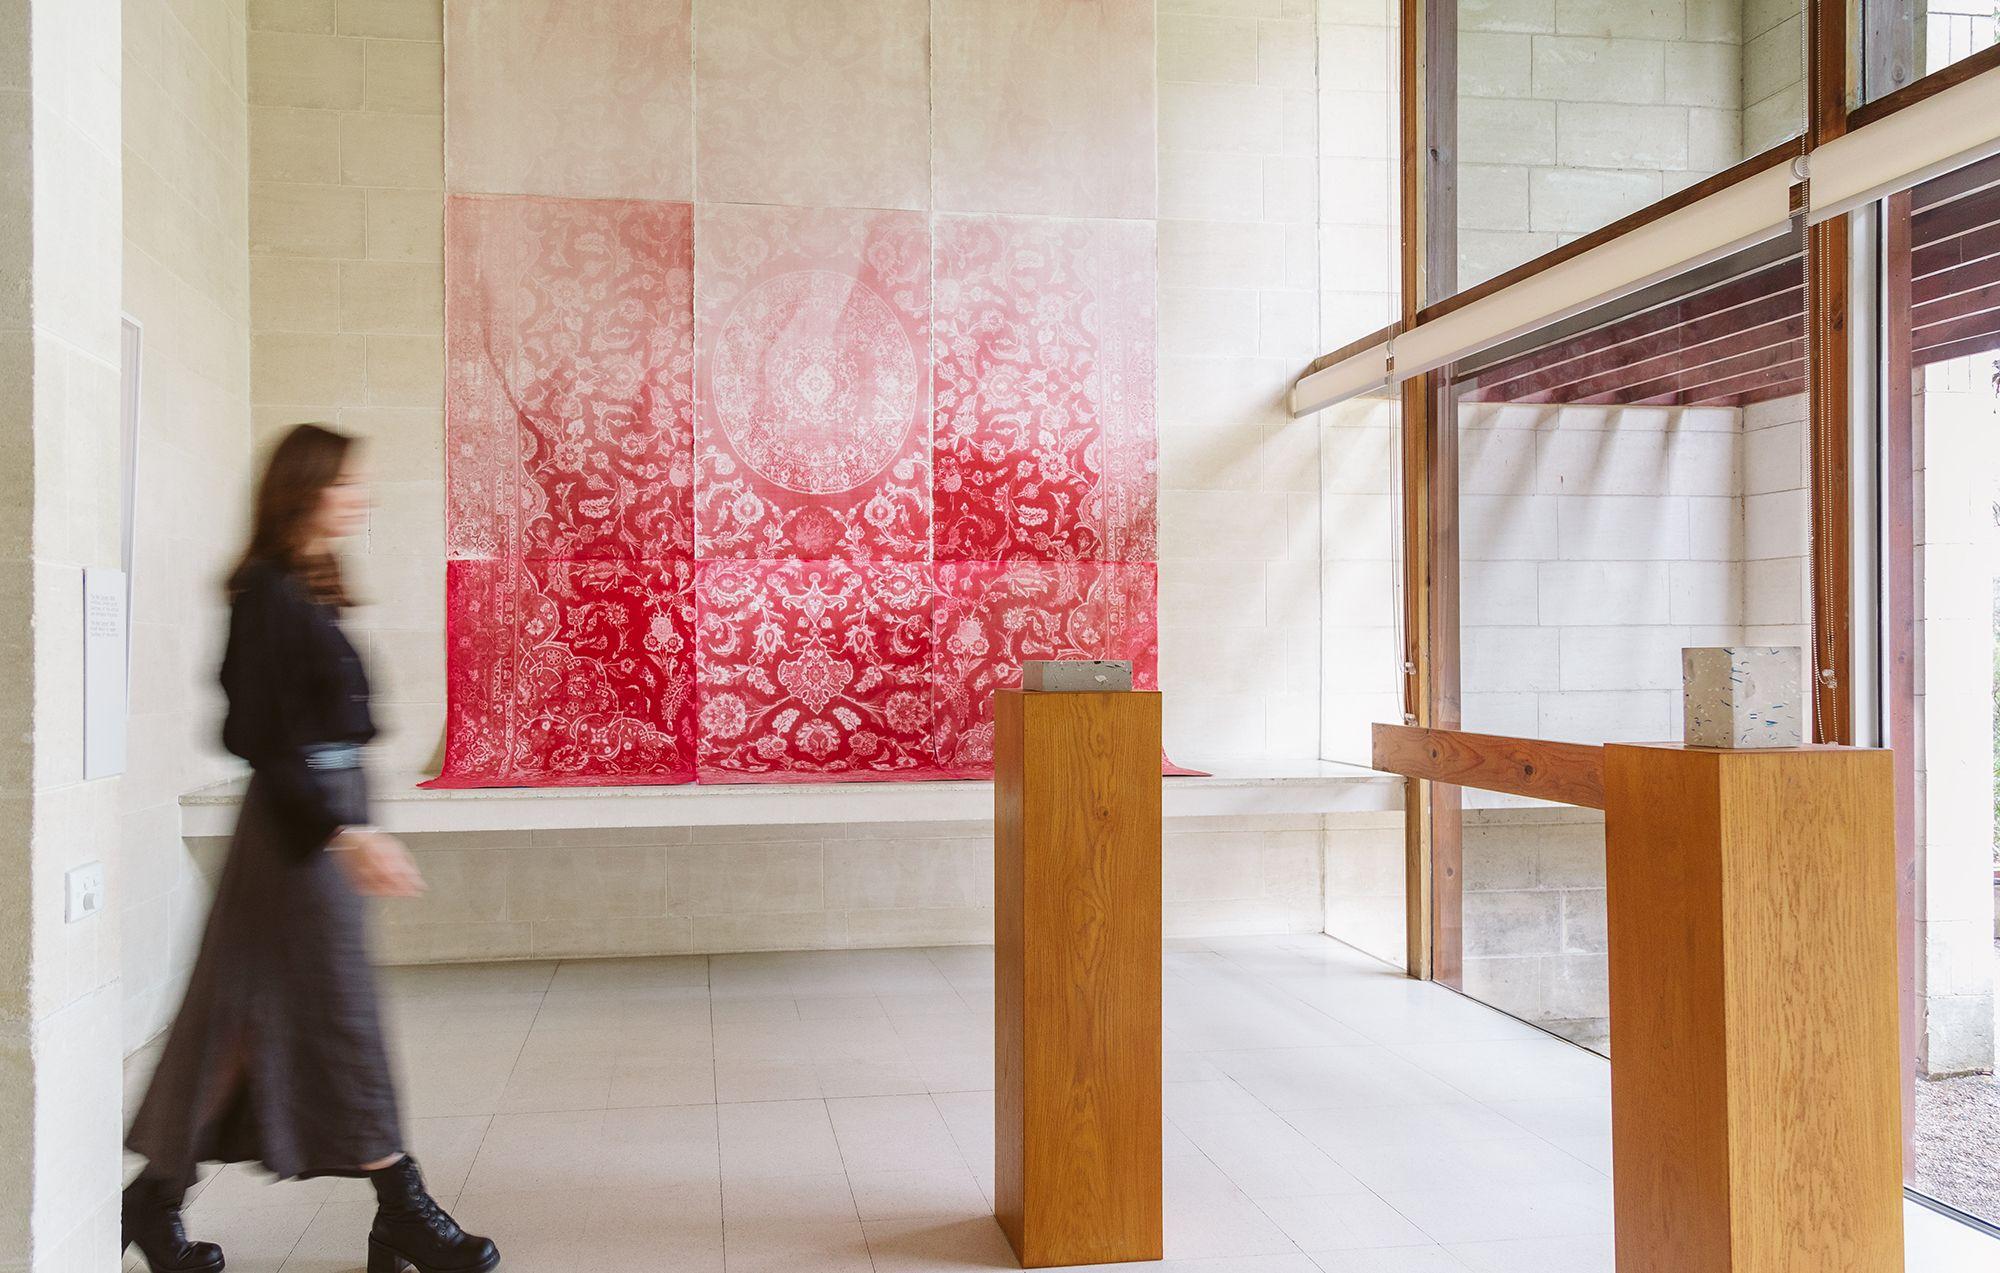 Installation view of the exhibition 'Stanislava Pinchuk: Terra Data' at Heide Museum of Modern Art, 20 March 20 June 2021. Photo by Clytie Meredith.